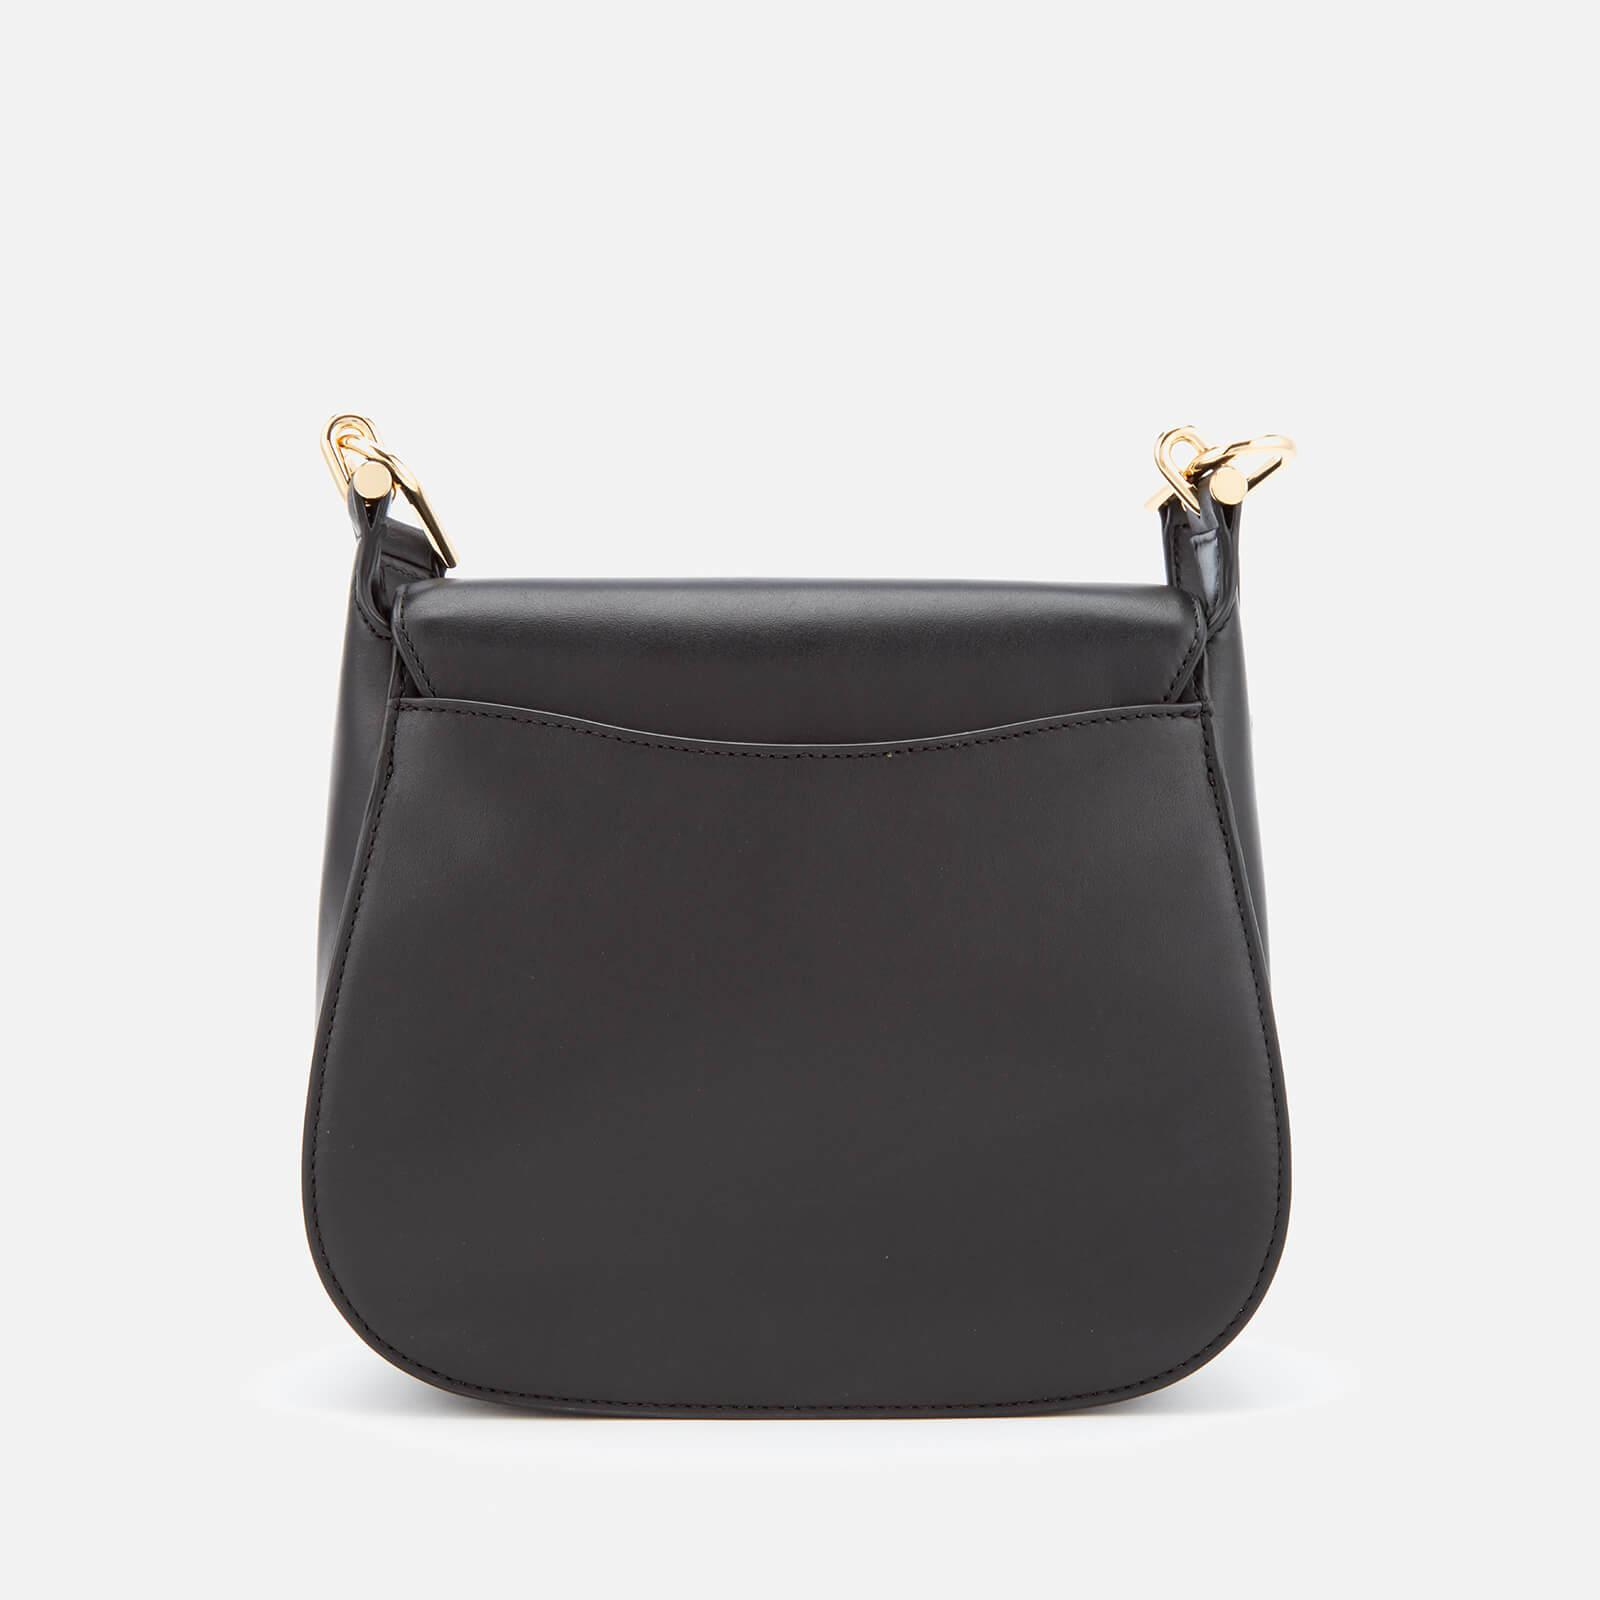 ab90c96c7d39 MICHAEL Michael Kors Delfina Large Saddle Bag in Black - Lyst